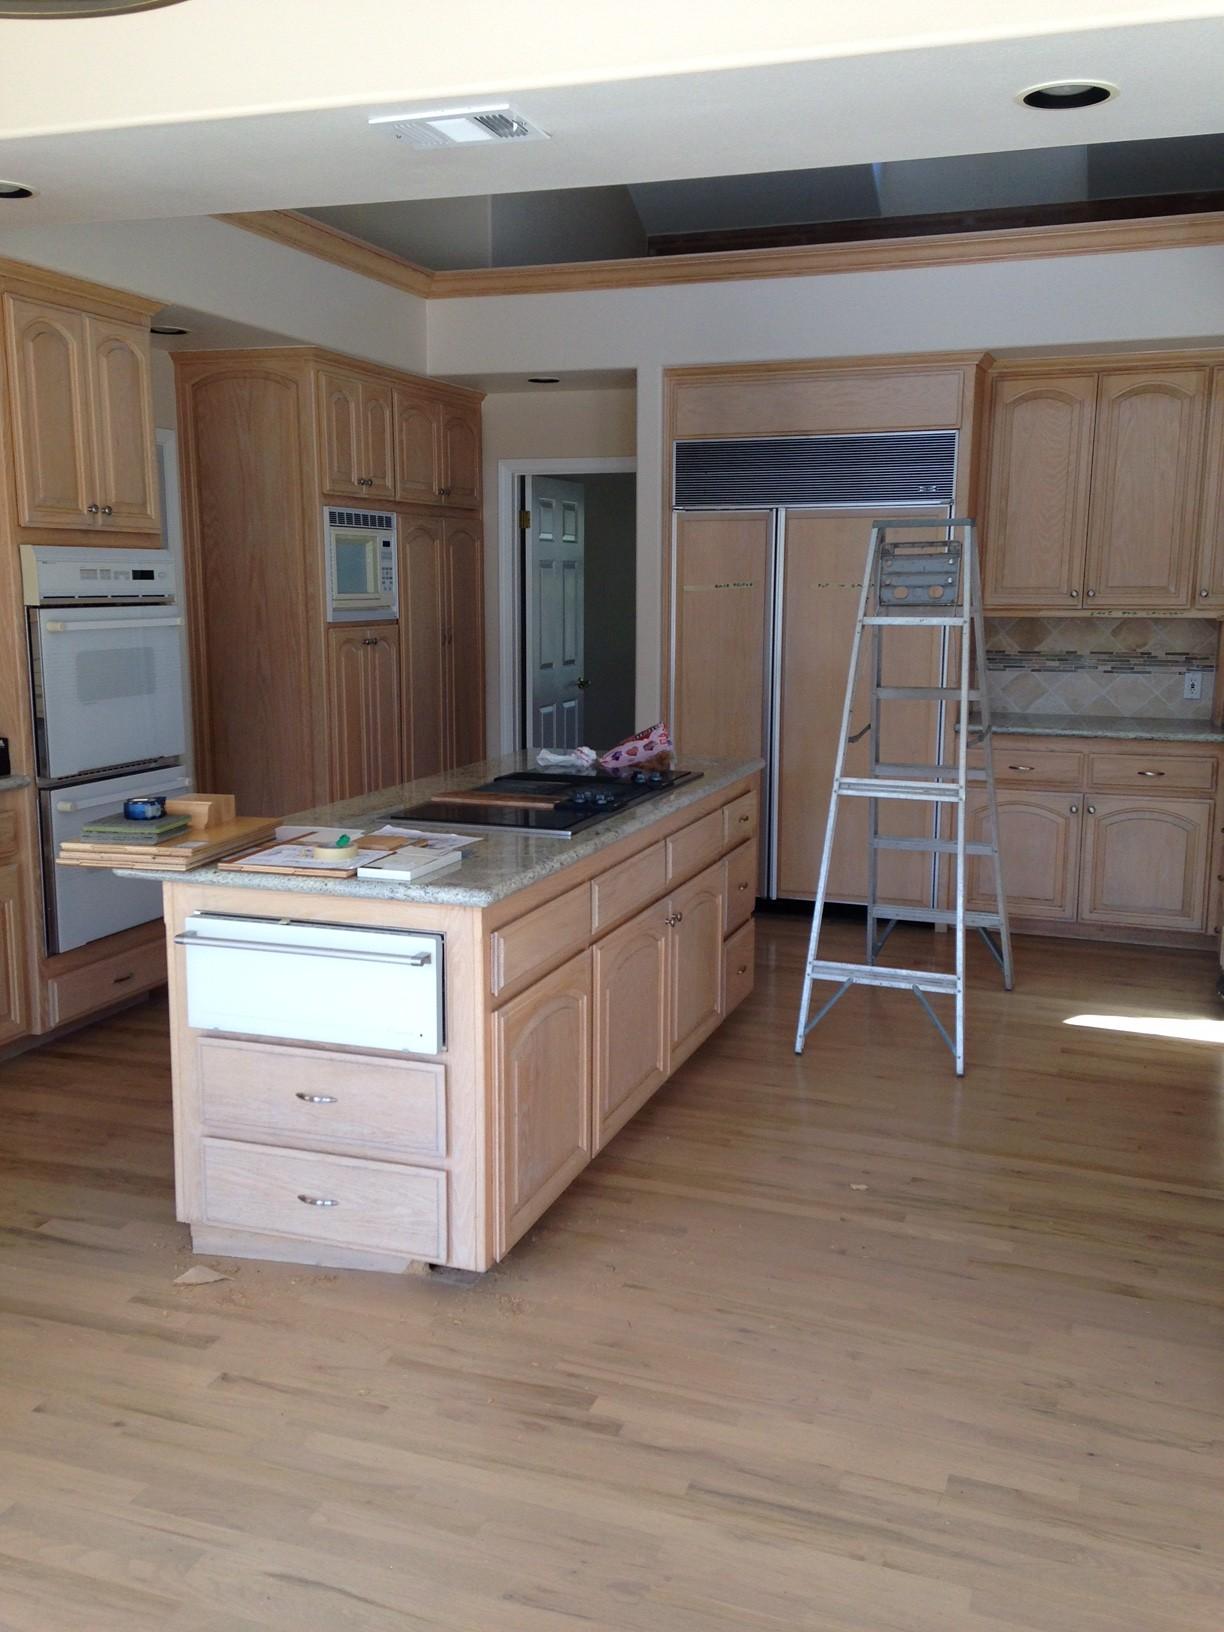 Atascadero Dream Kitchen: Before